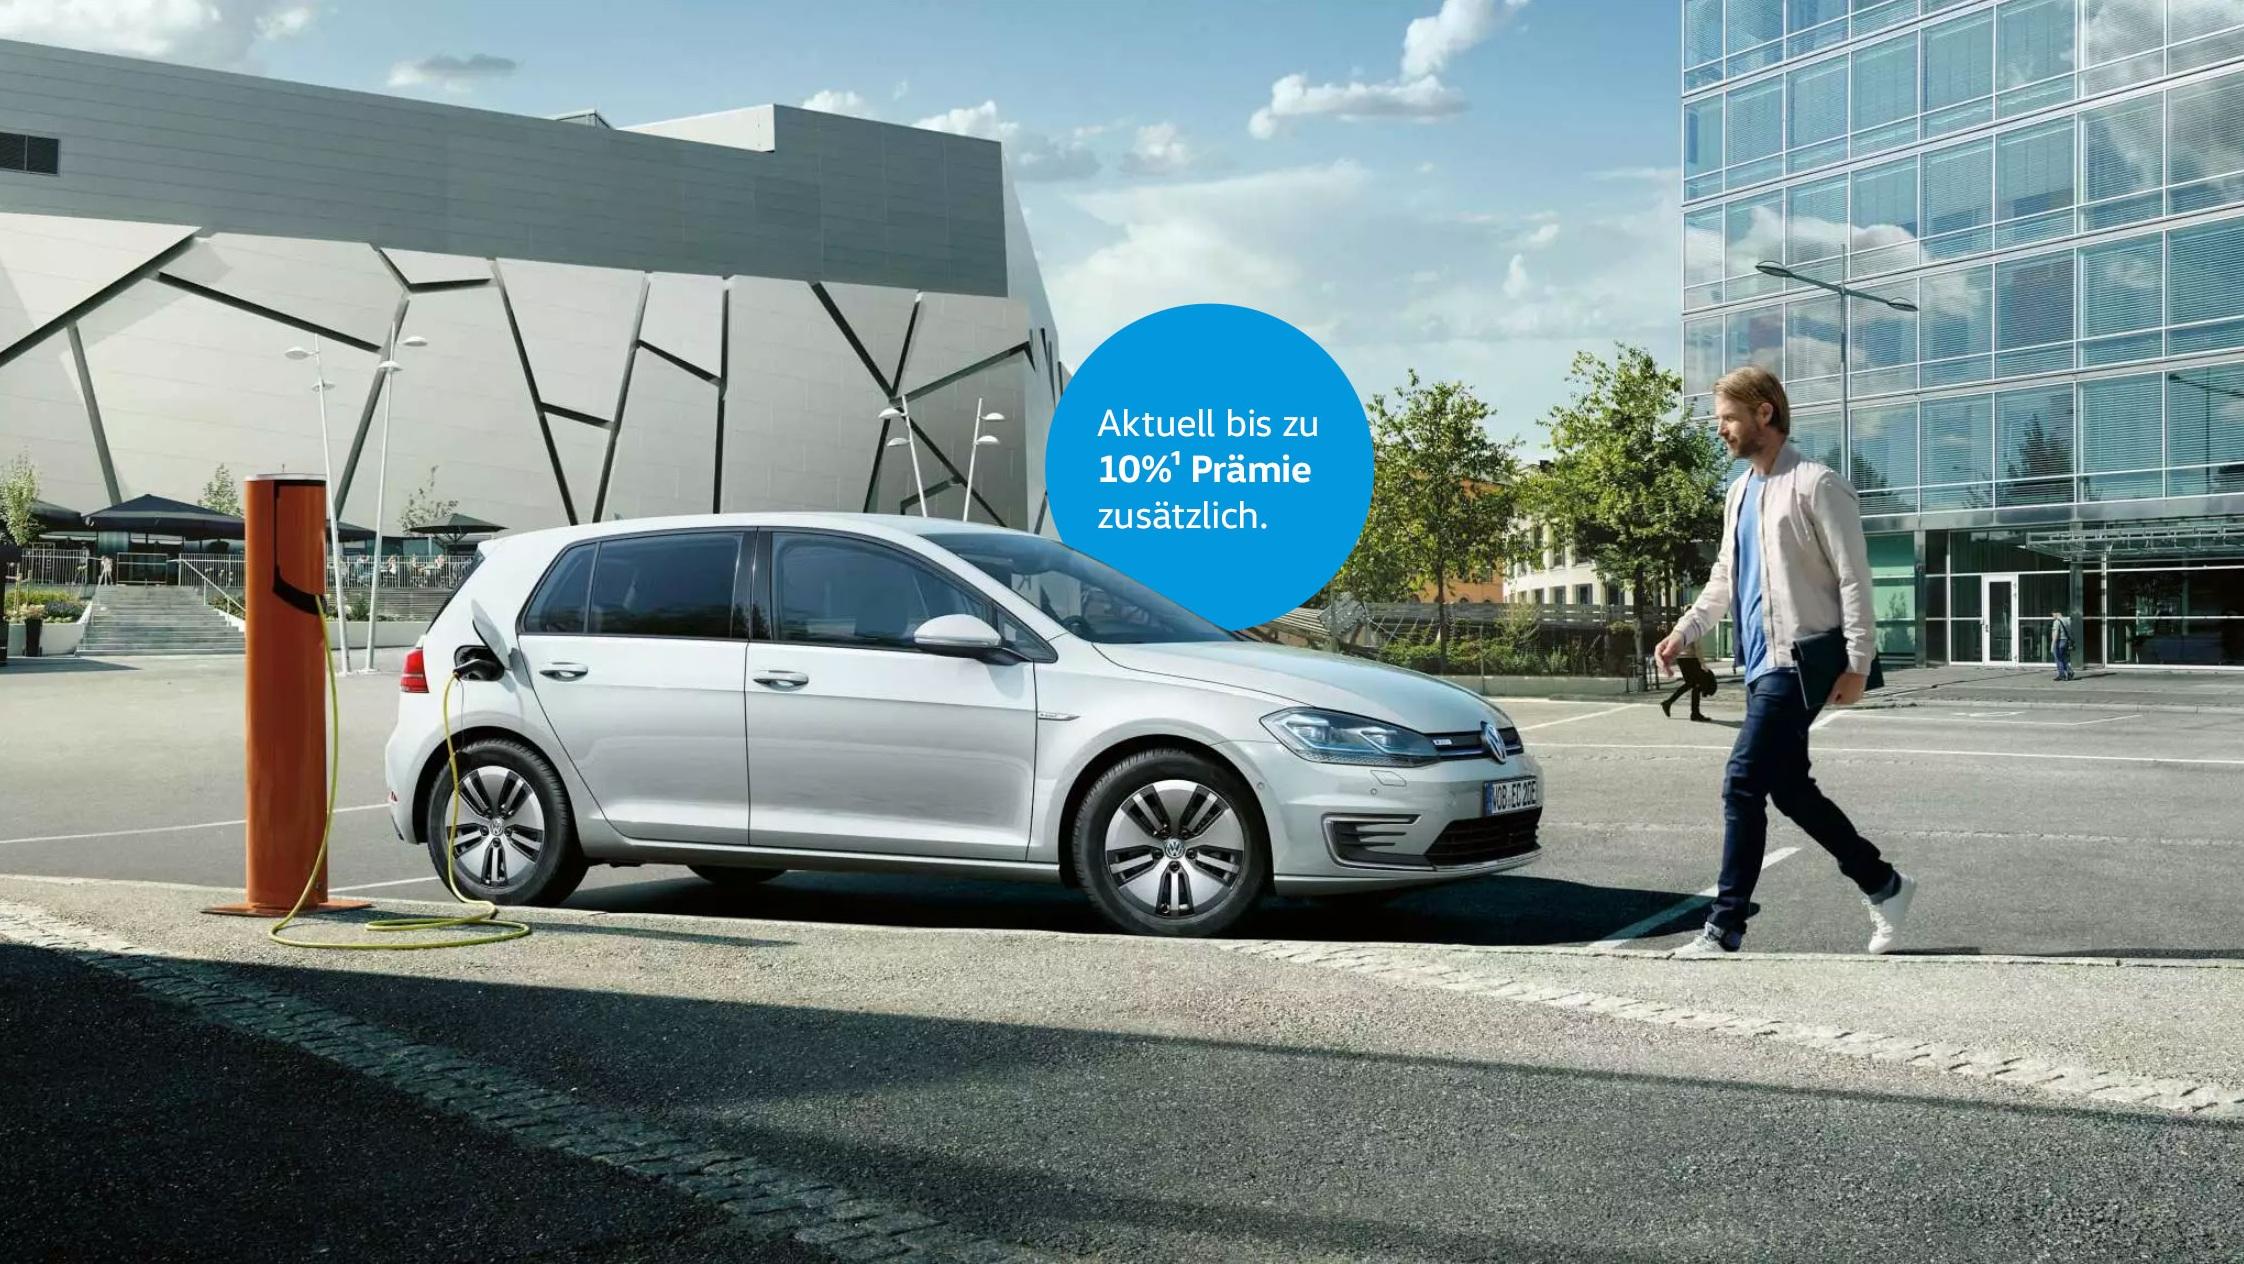 VW e-Golf Stromverbrauch, kWh/100 km: kombiniert* 13,8 - 12,9; CO₂-Emission kombiniert*, g/km: 0; Effizienzklasse: A+*